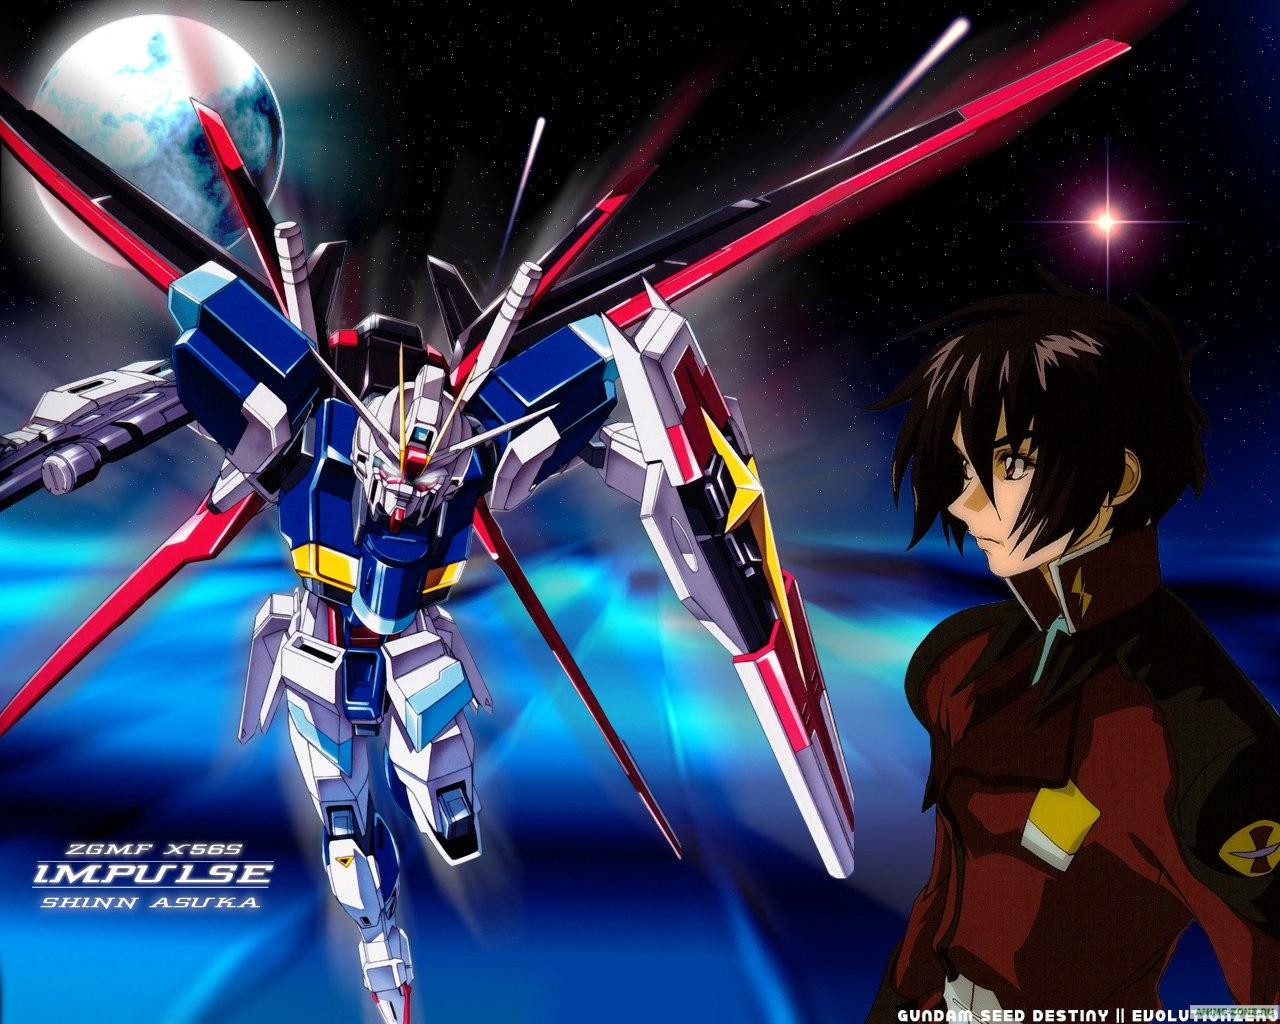 Gundam Seed Destiny images Gundam SEED Destiny HD 1280x1024